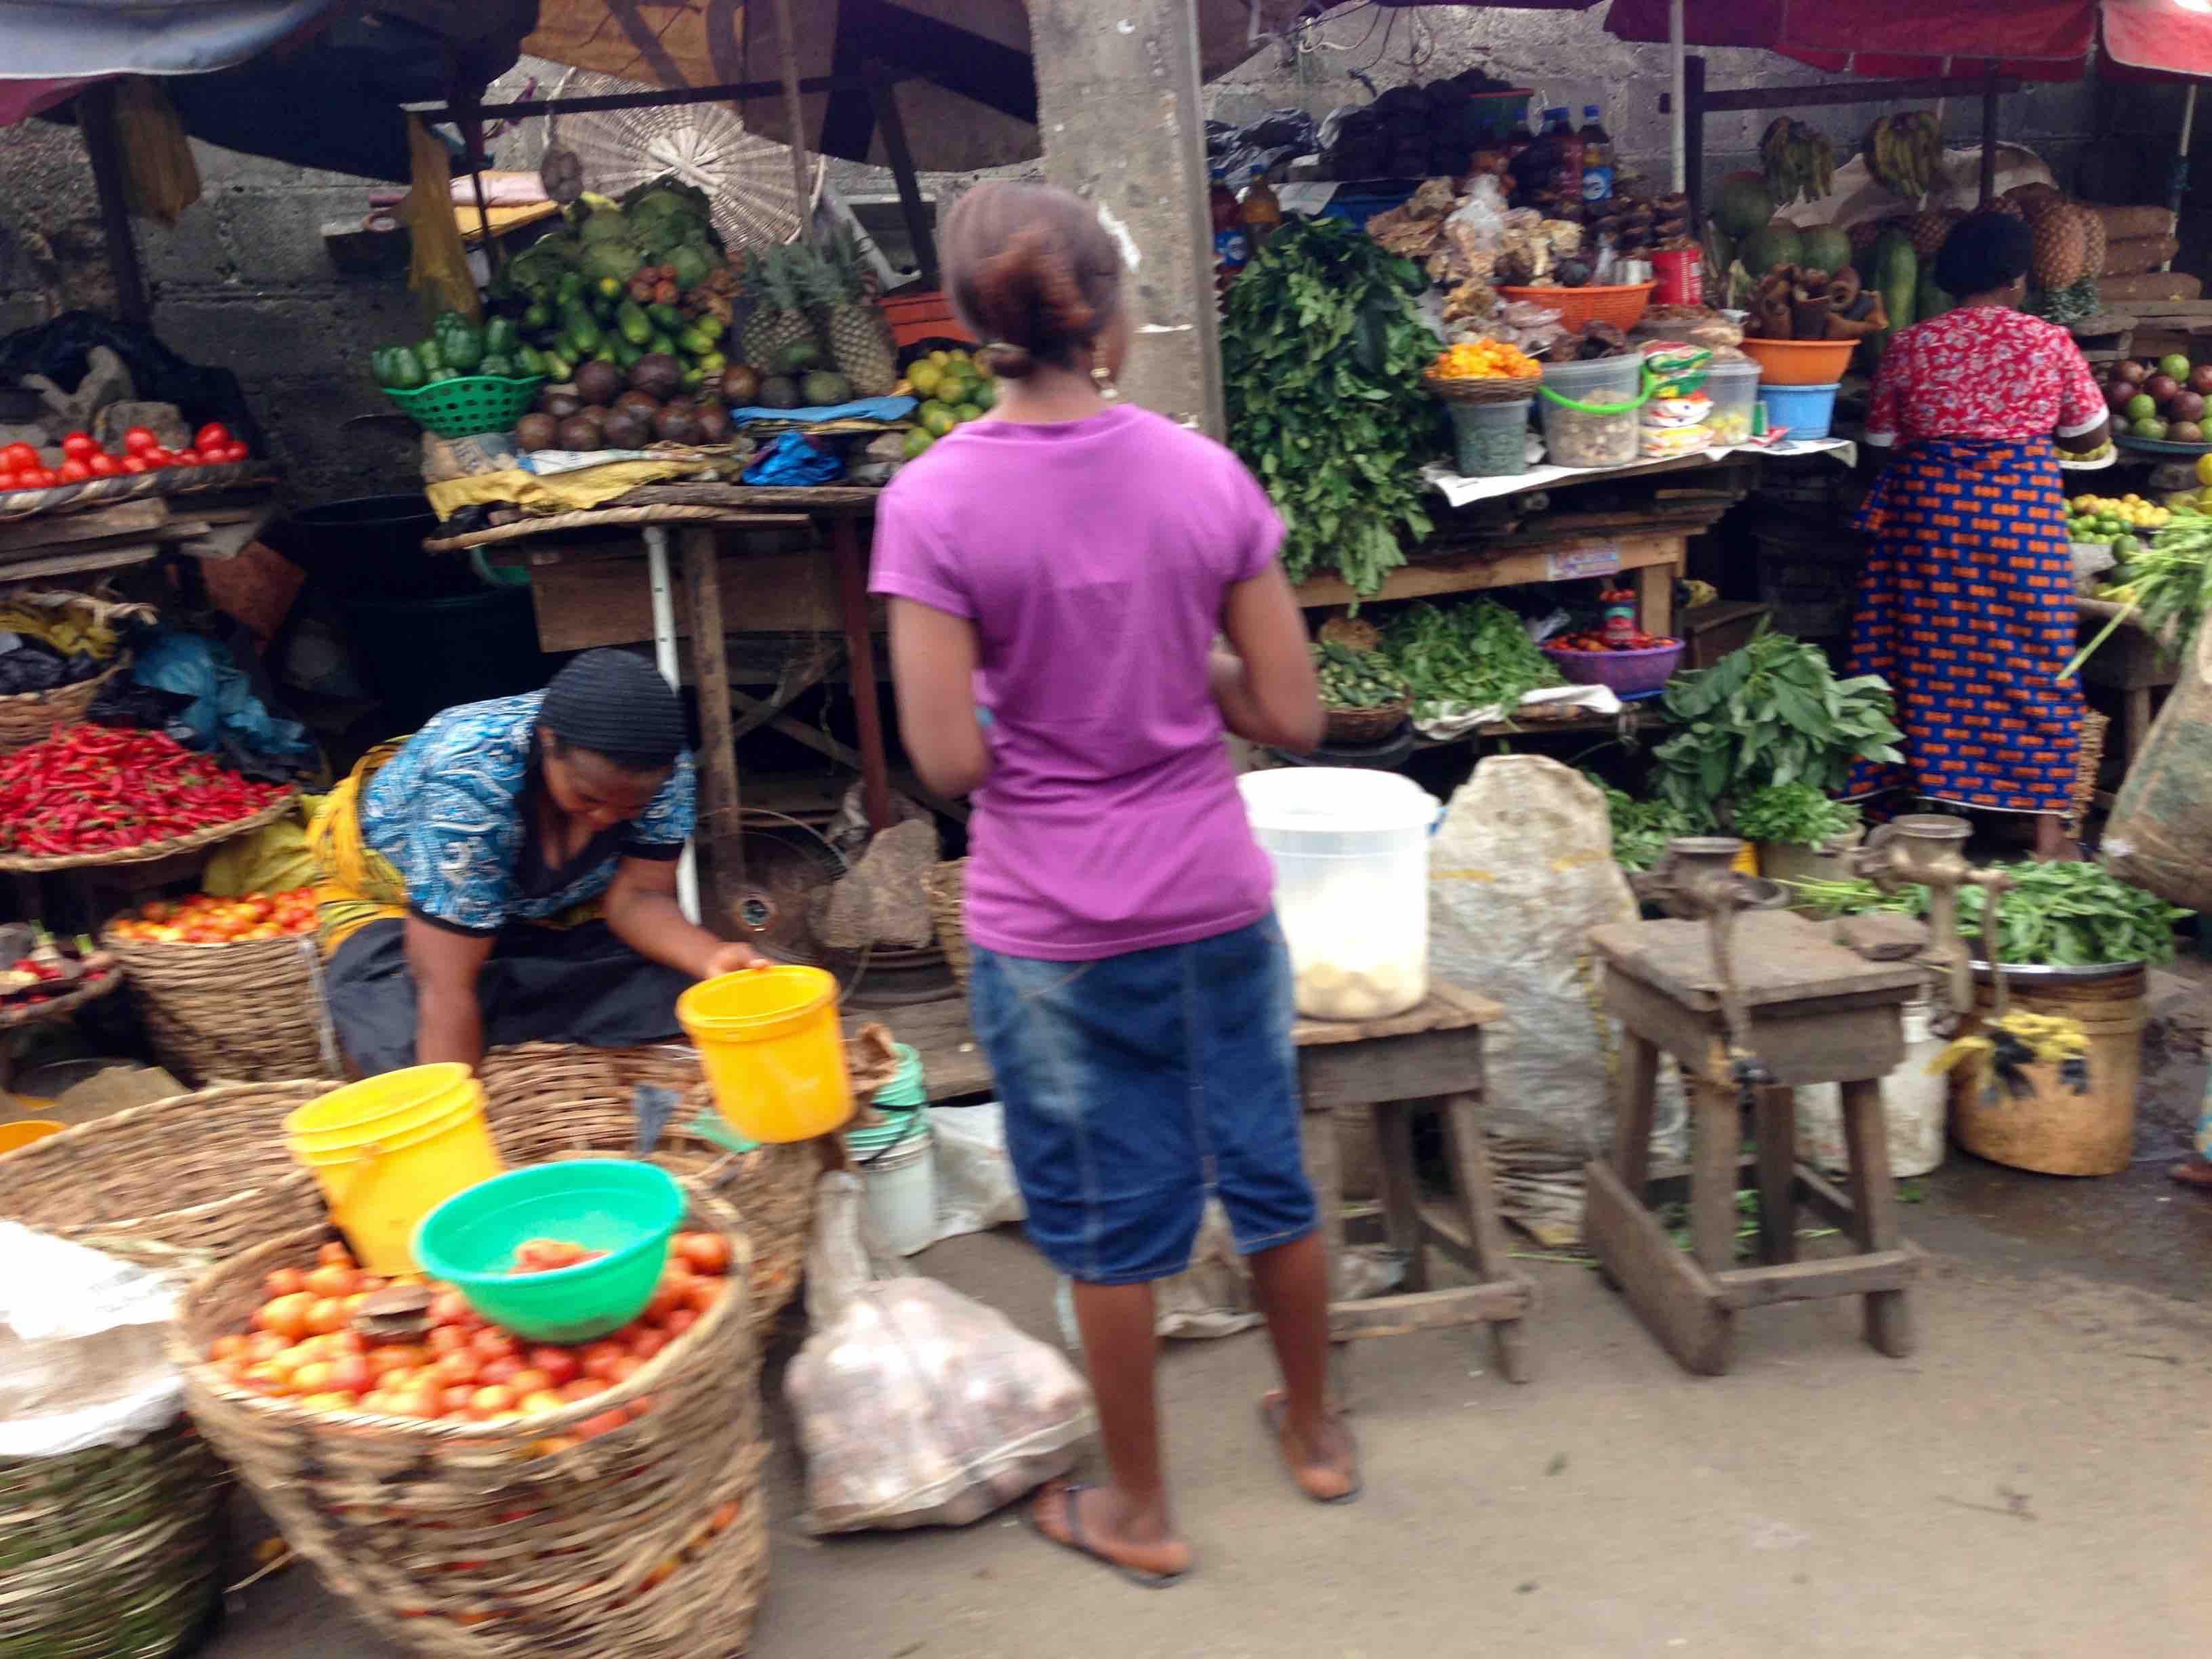 Produce market in Lagos, Nigeria. #JujuFilms